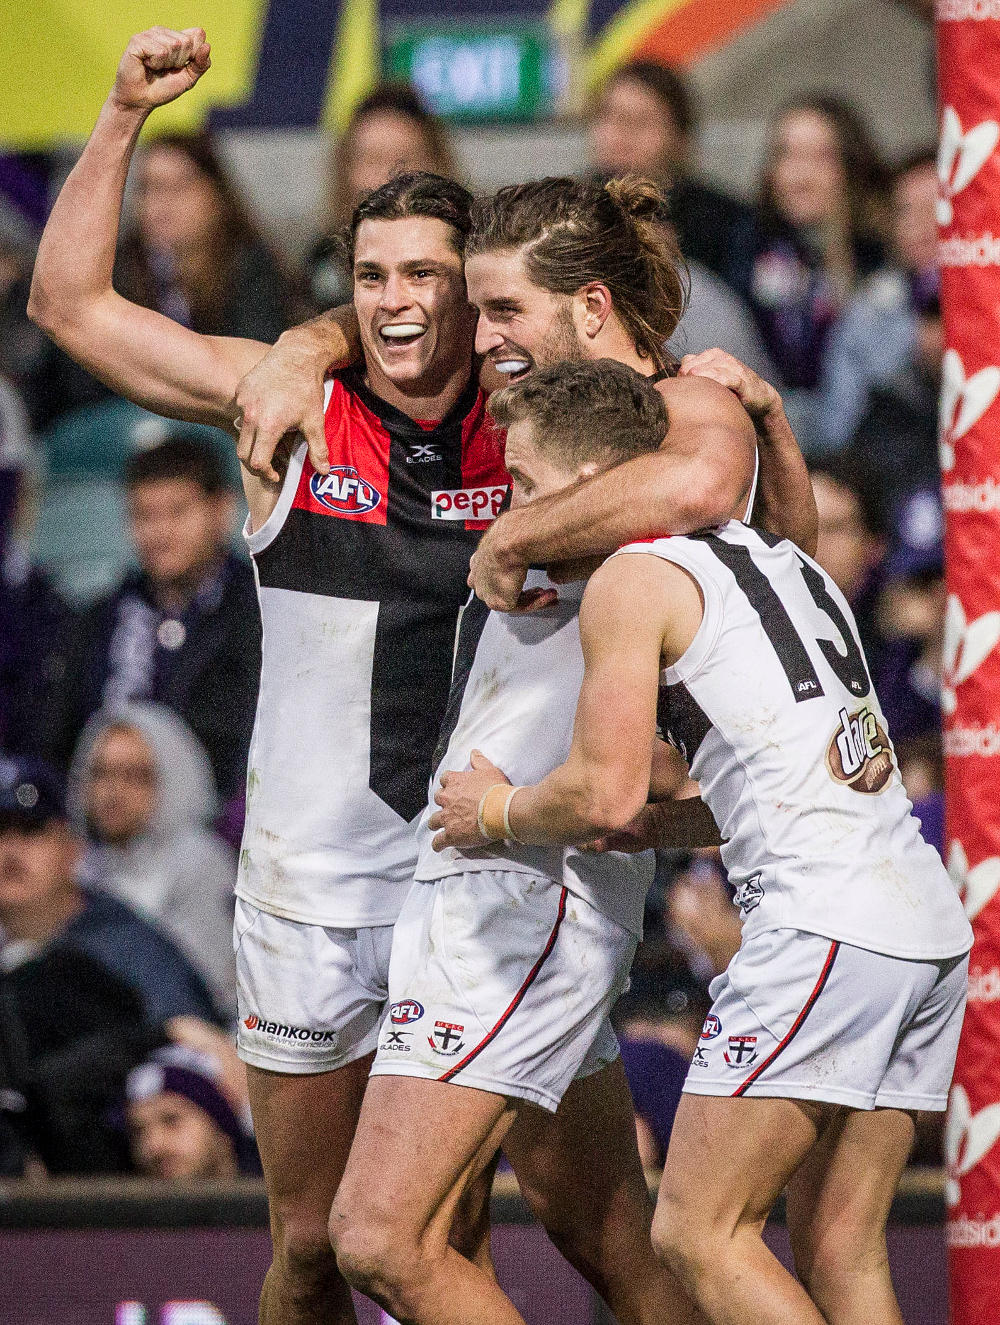 Jack Steele Josh Bruce St Kilda Saints AFL 2017 tall